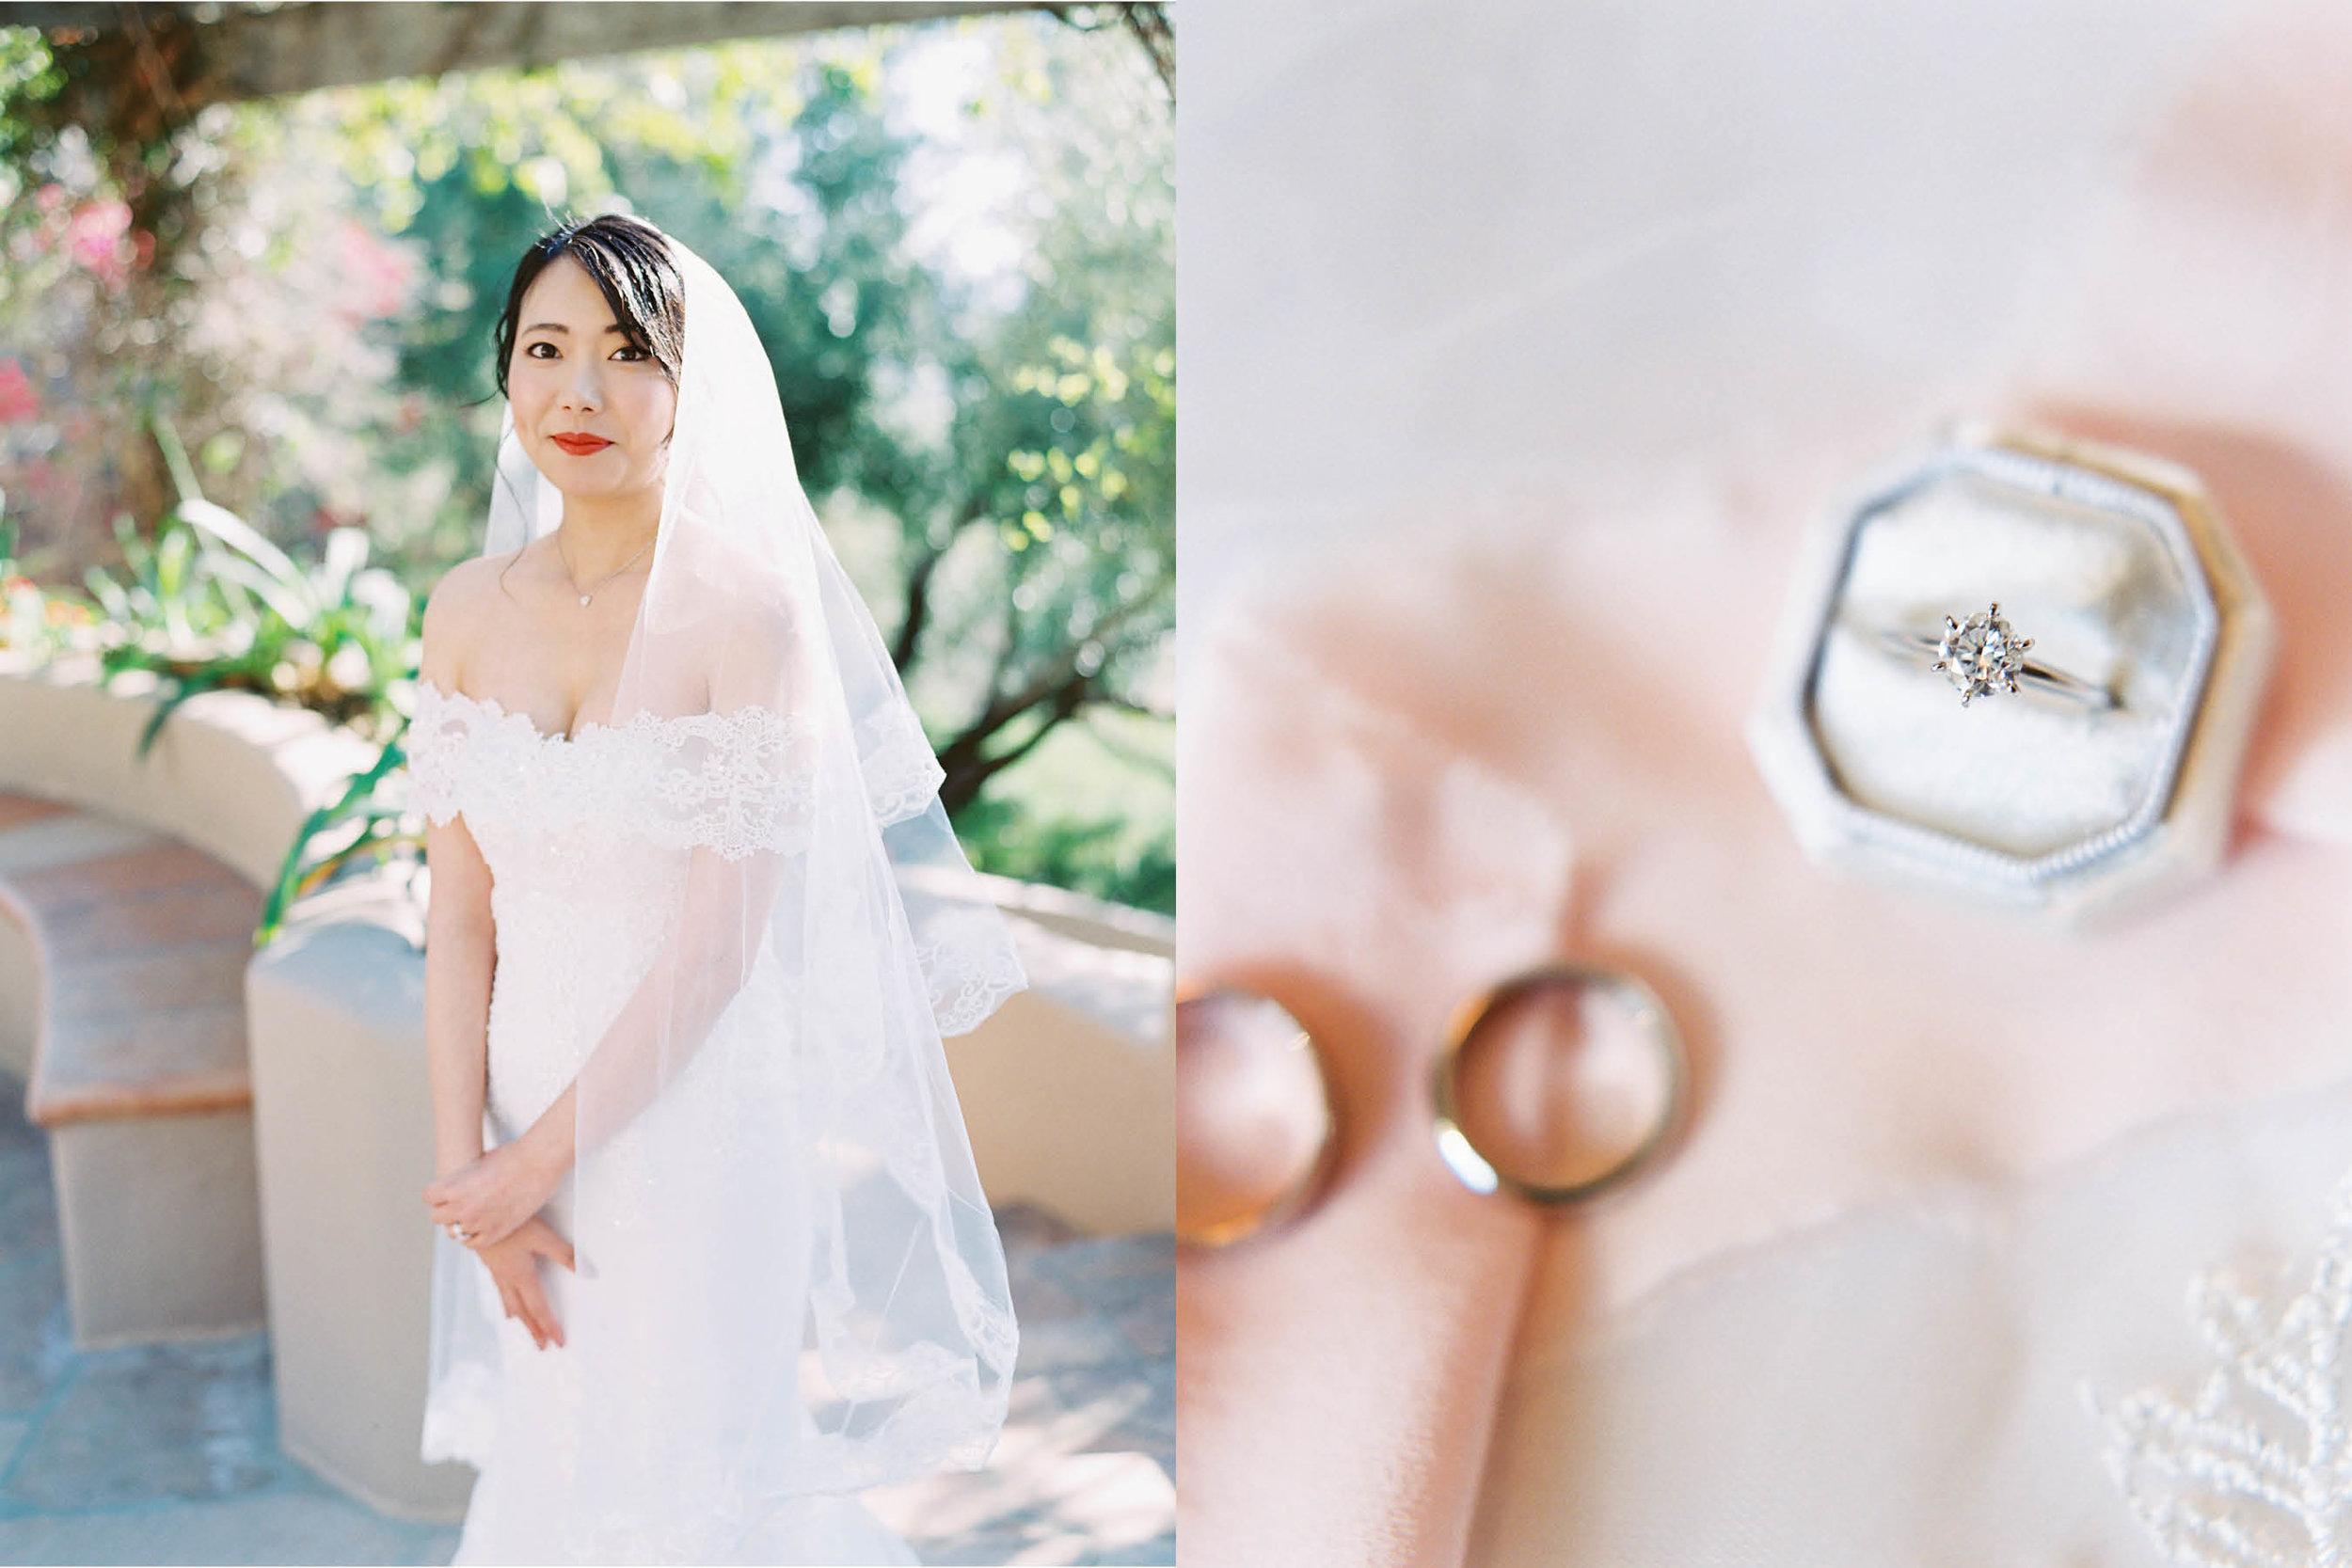 santa-barbara-elopement-wedding-planner-planning-coordinator-coordination-event-design-villa-verano-estate-riviera-garden-olive-tree-asian-day-of-palm-tree (3).jpg